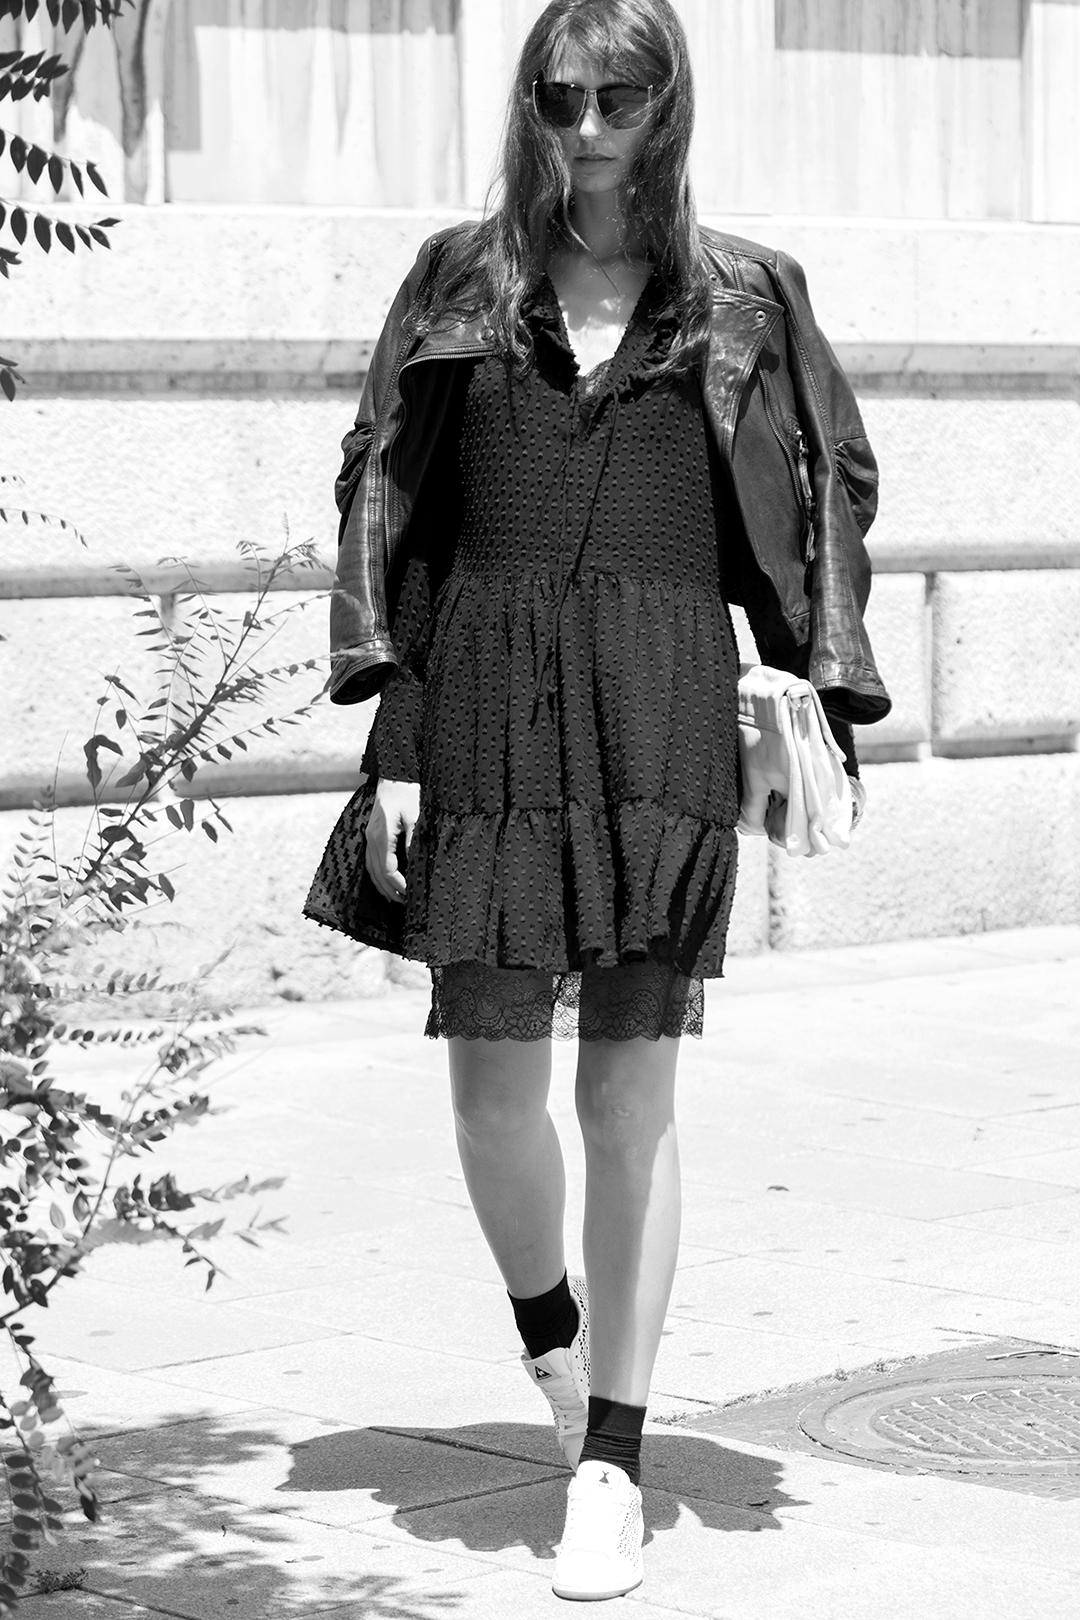 le-petite-robe-noir-mitmeblog-streetstyle-guerlain-bn-web-02